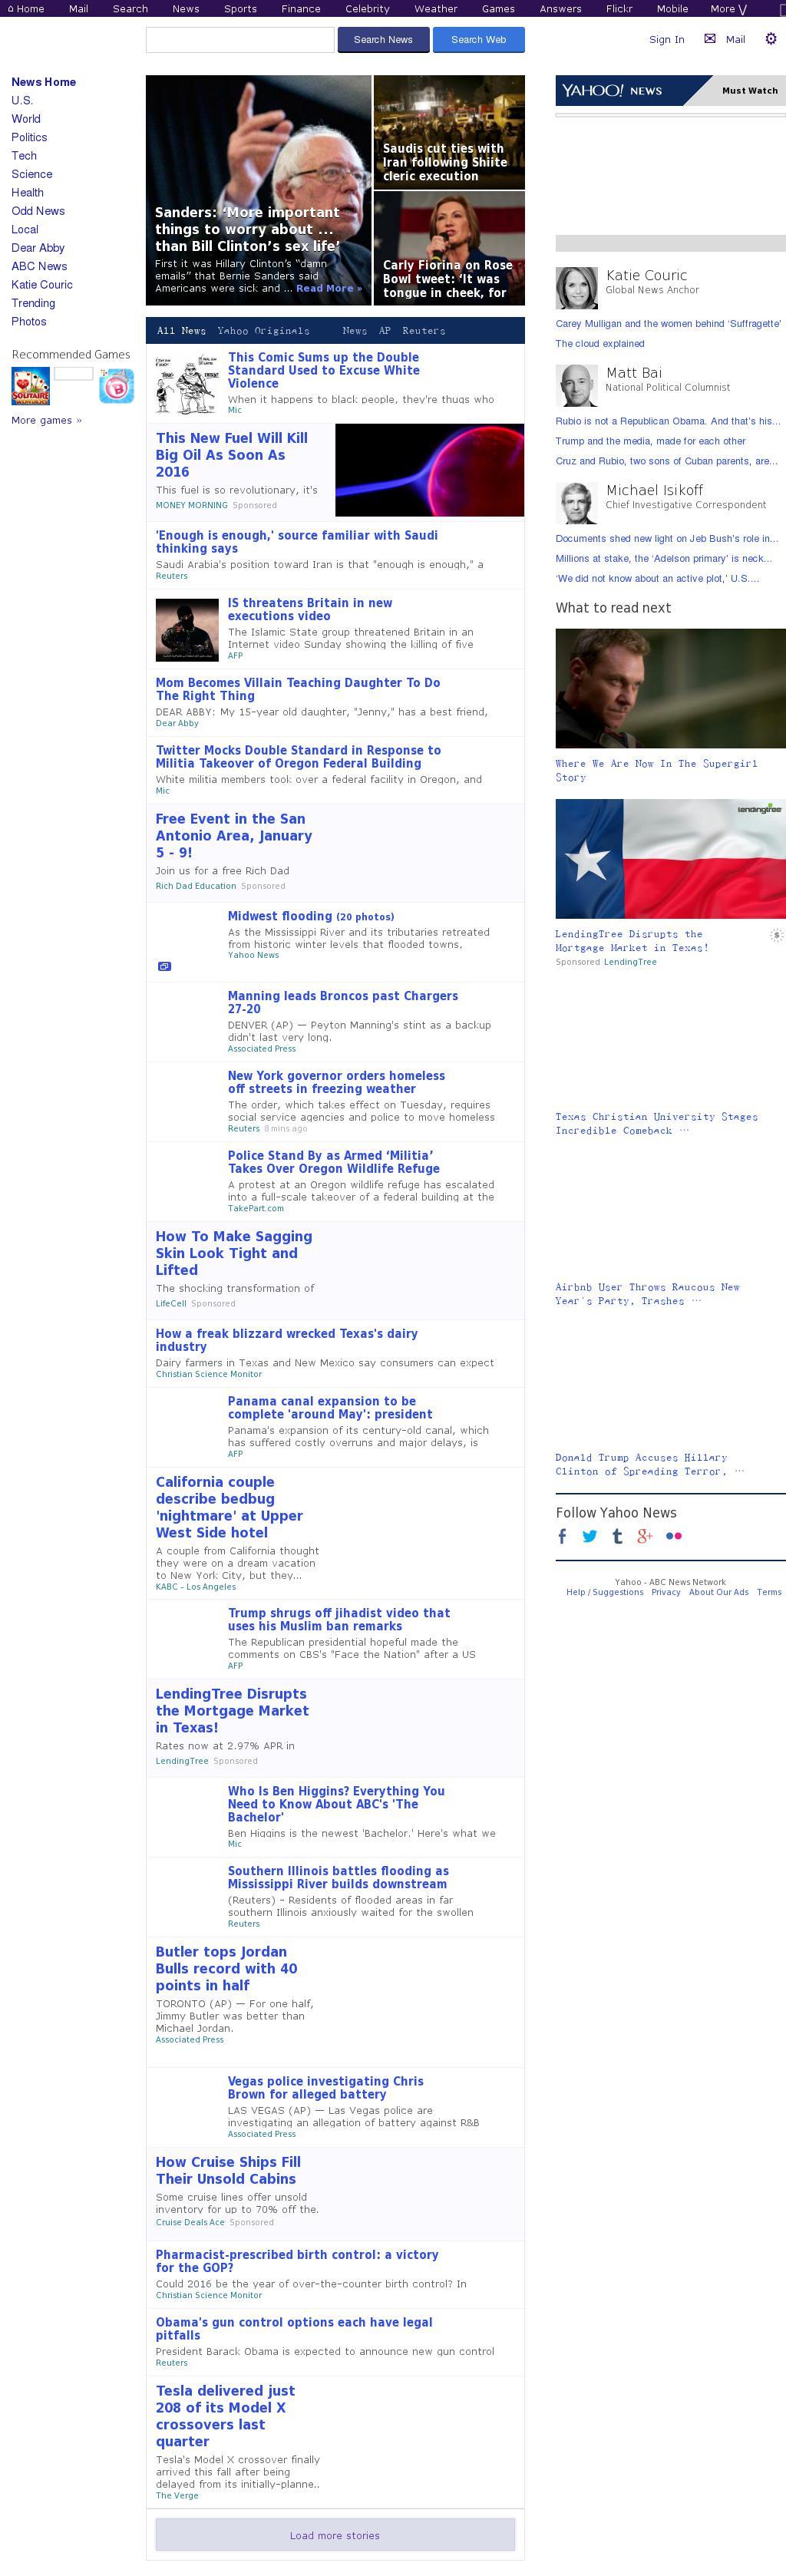 Yahoo! News at Monday Jan. 4, 2016, 2:38 a.m. UTC